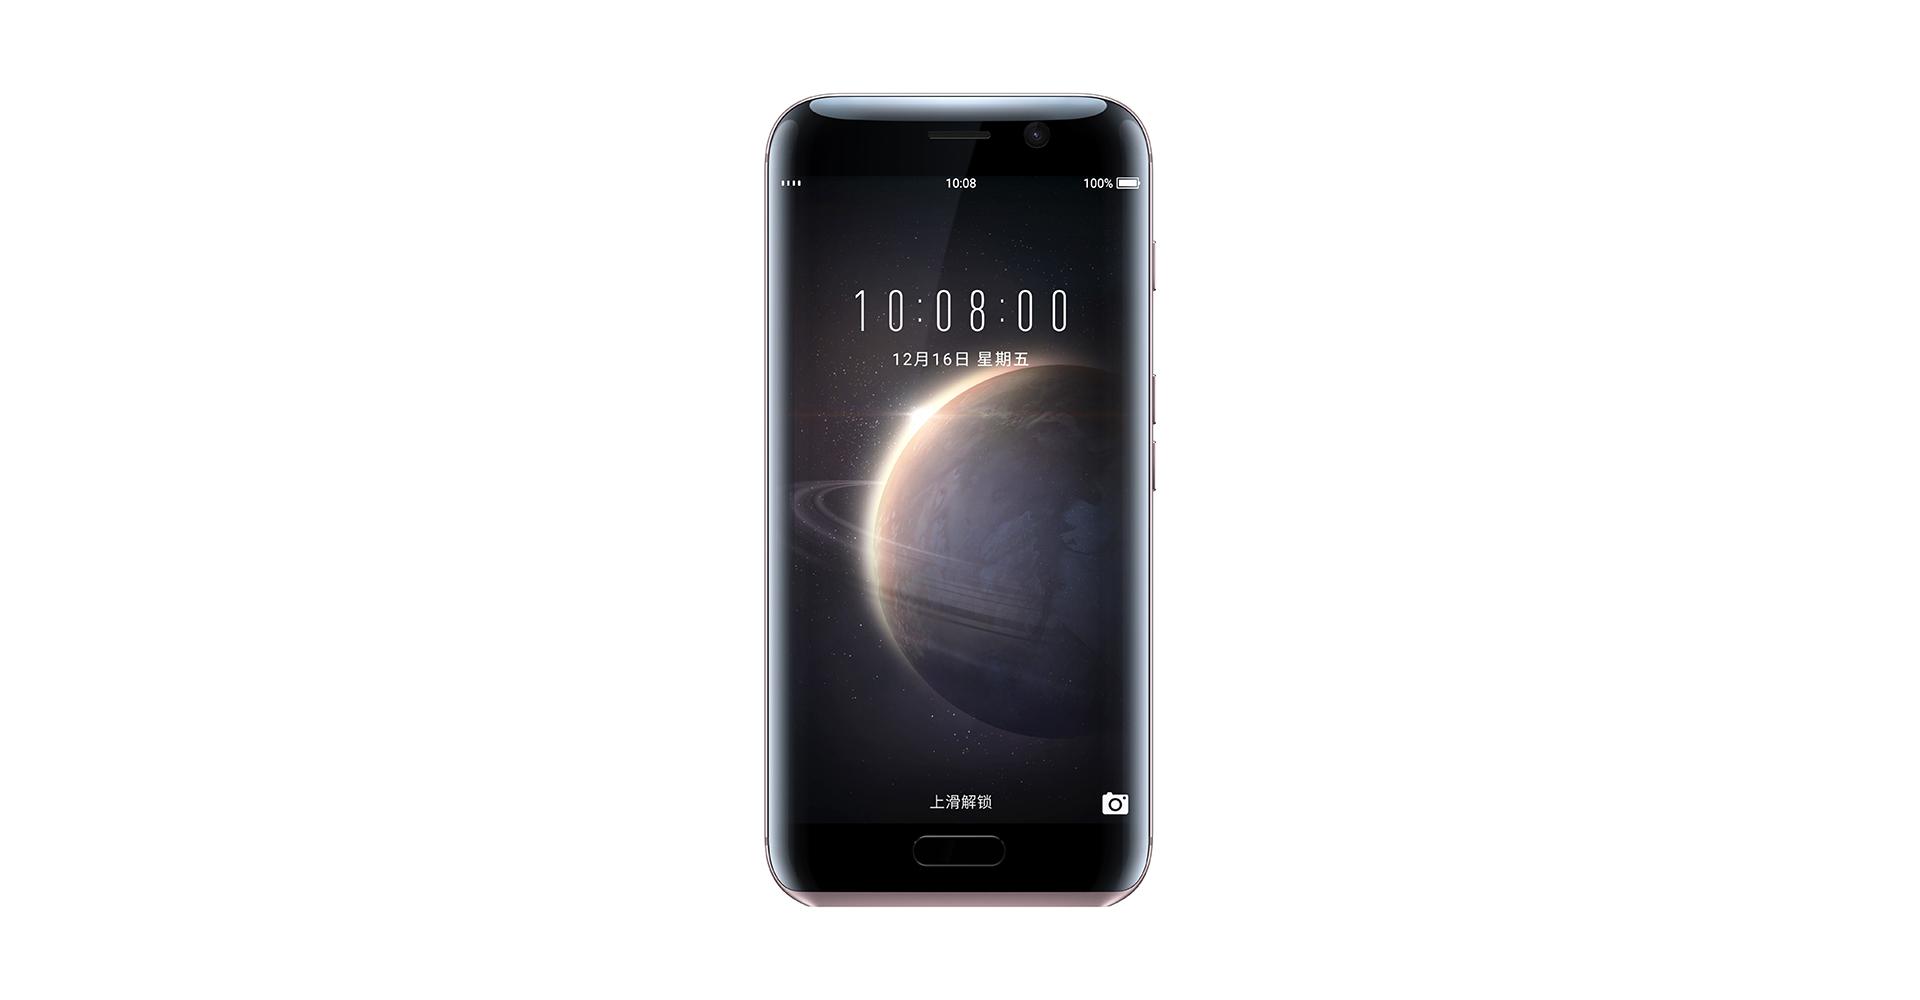 Huawei、人工知能アシスタント搭載スマホ、「Honor Magic」を発表